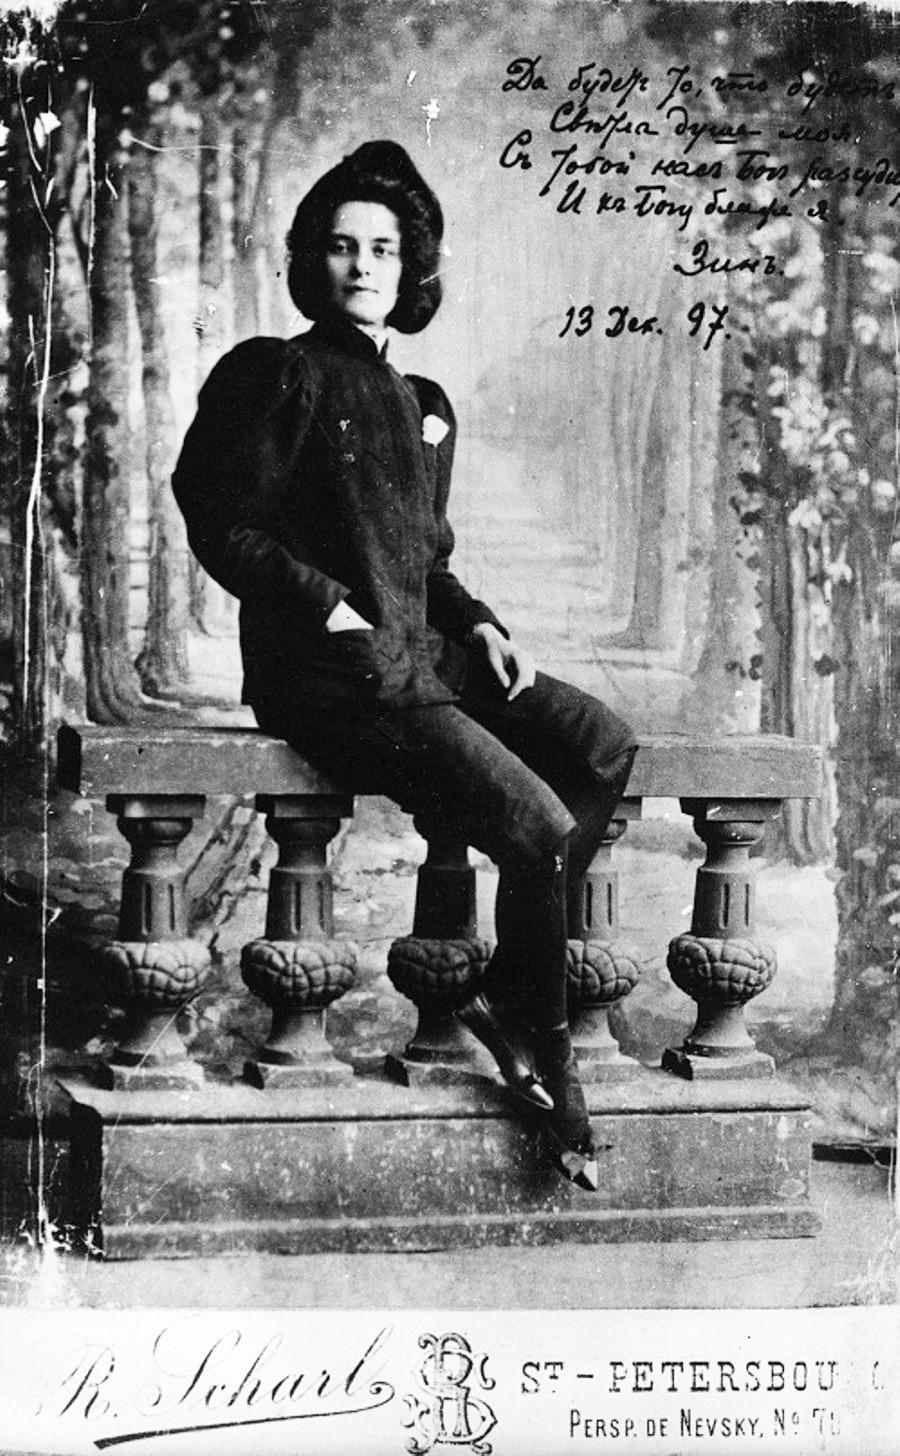 Guíppius, em 13 de dezembro de 1897